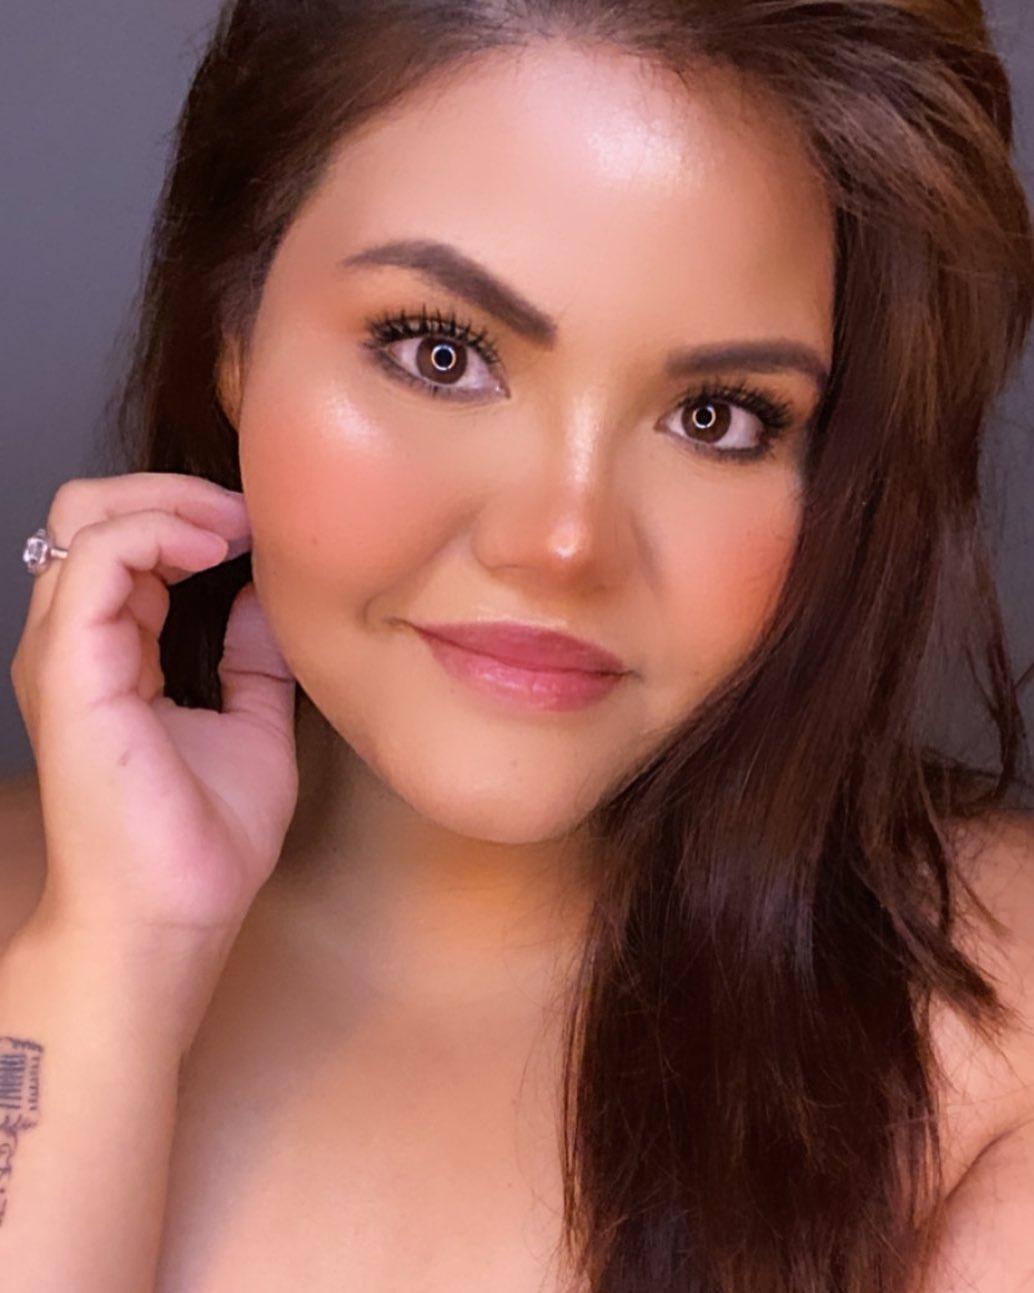 Yuliana Martinez la voz